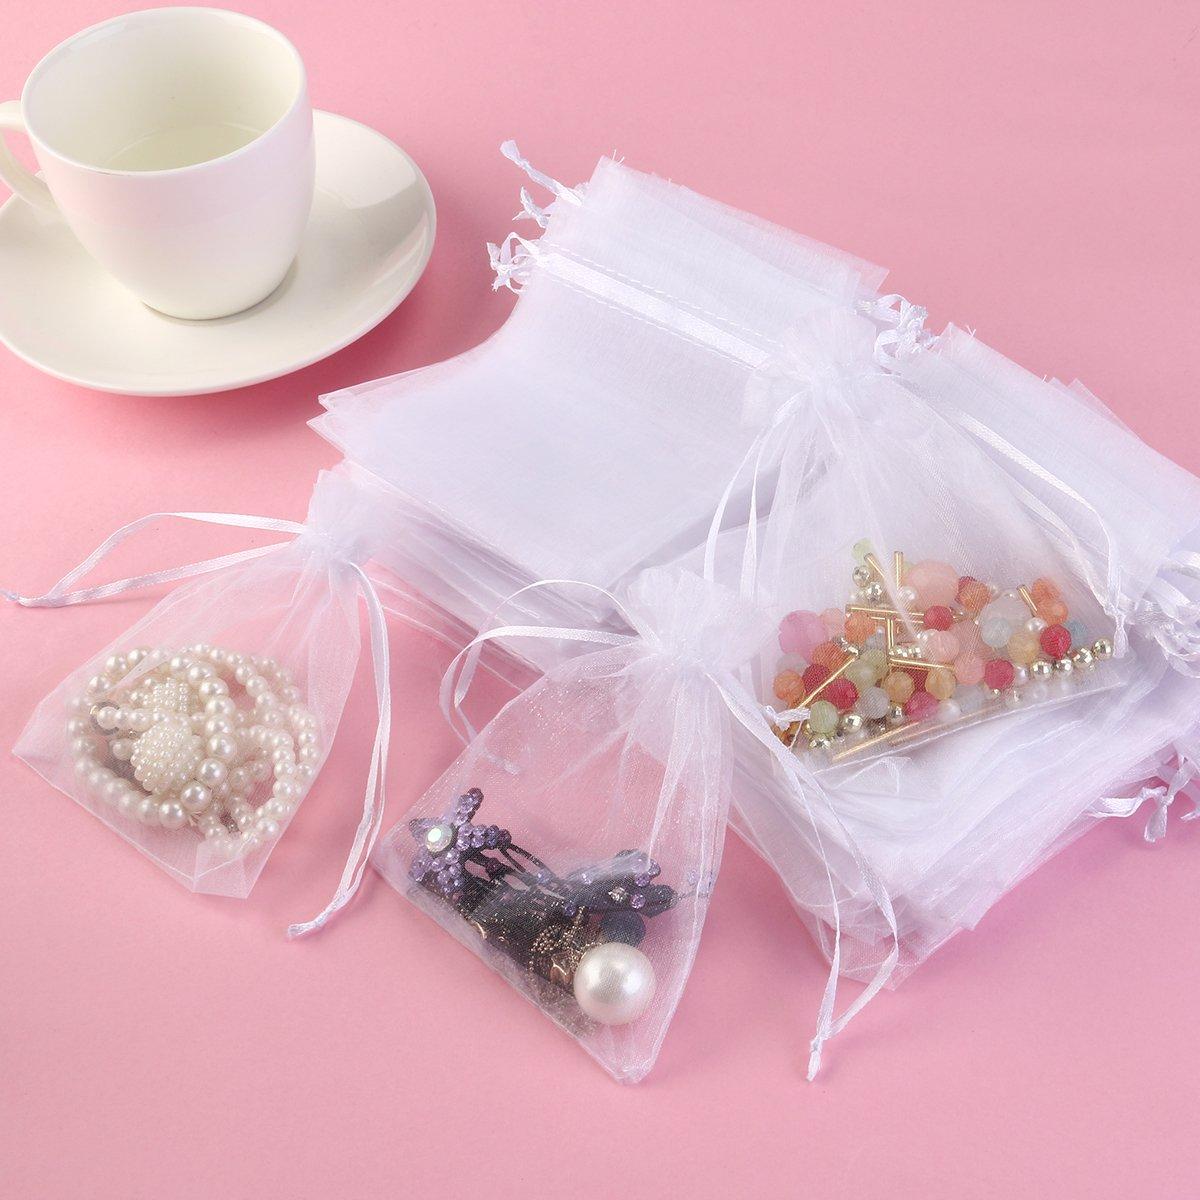 Amazon.com: Foxnovo Organza Drawstring Gift Bags (50Pcs -13x18cm ...